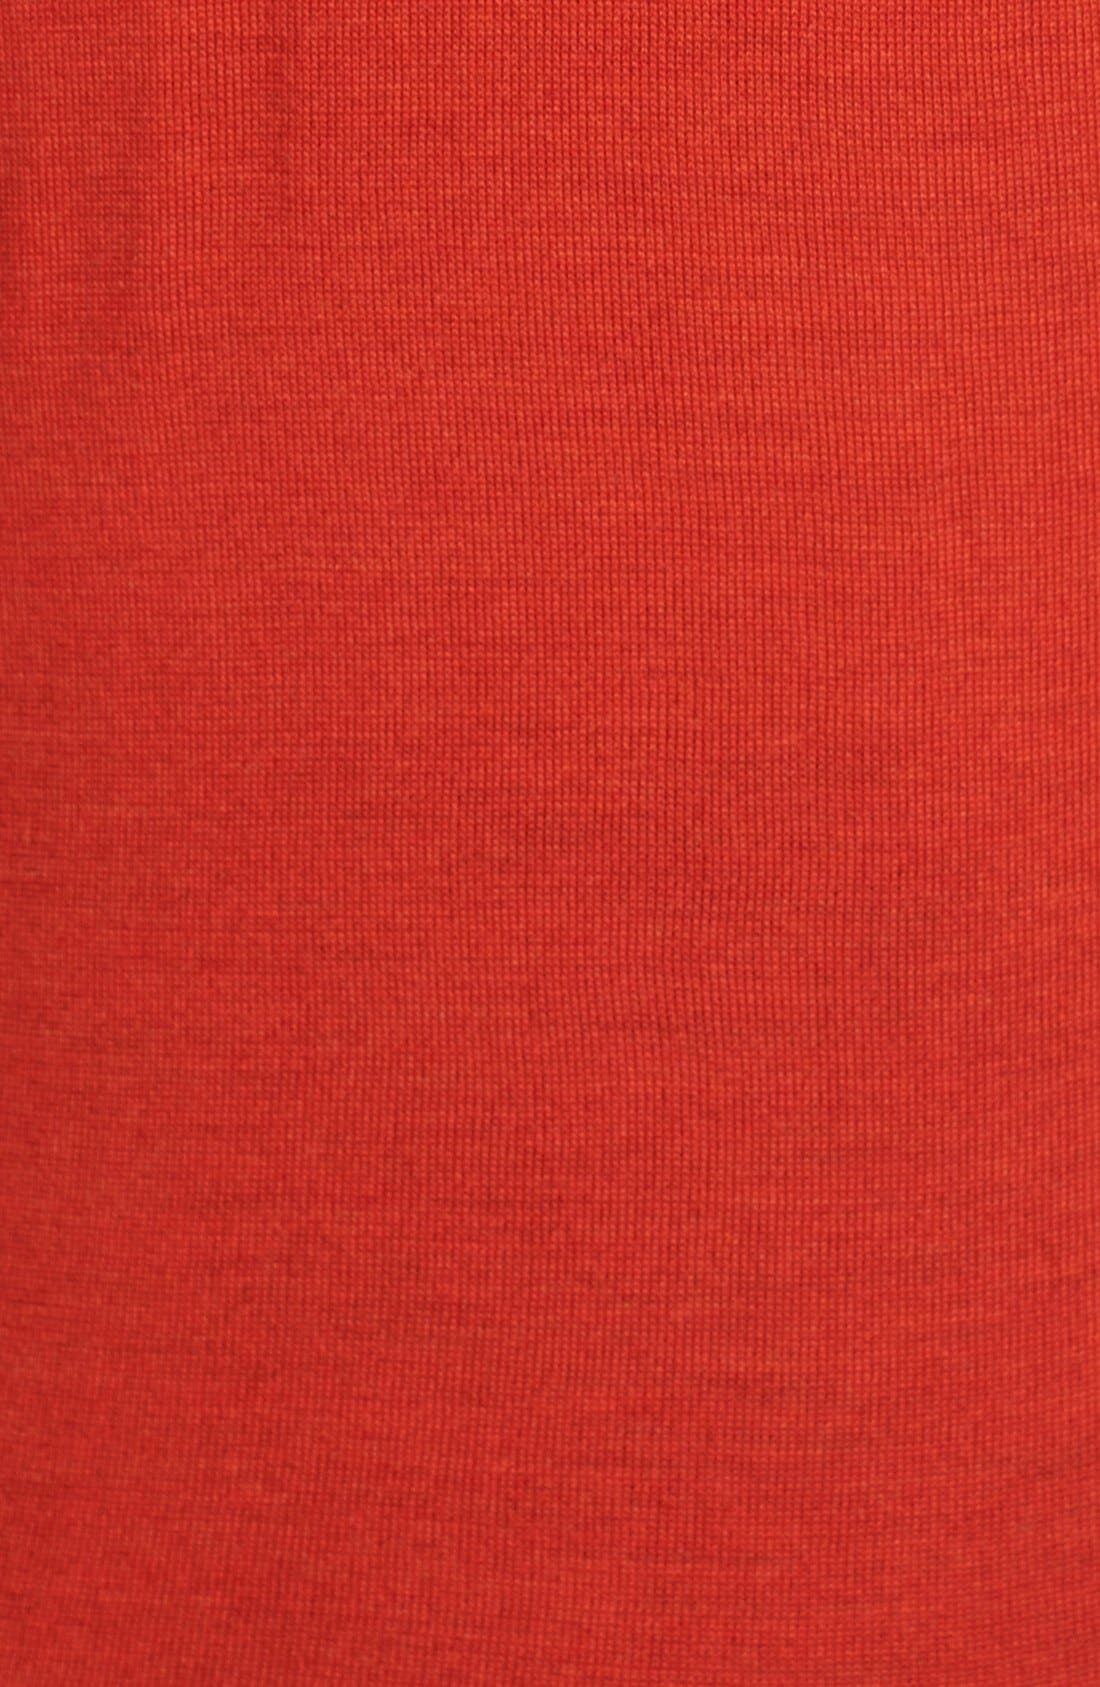 Alternate Image 3  - Eileen Fisher Wool Jewel Neck Muscle Tee (Regular & Petite)